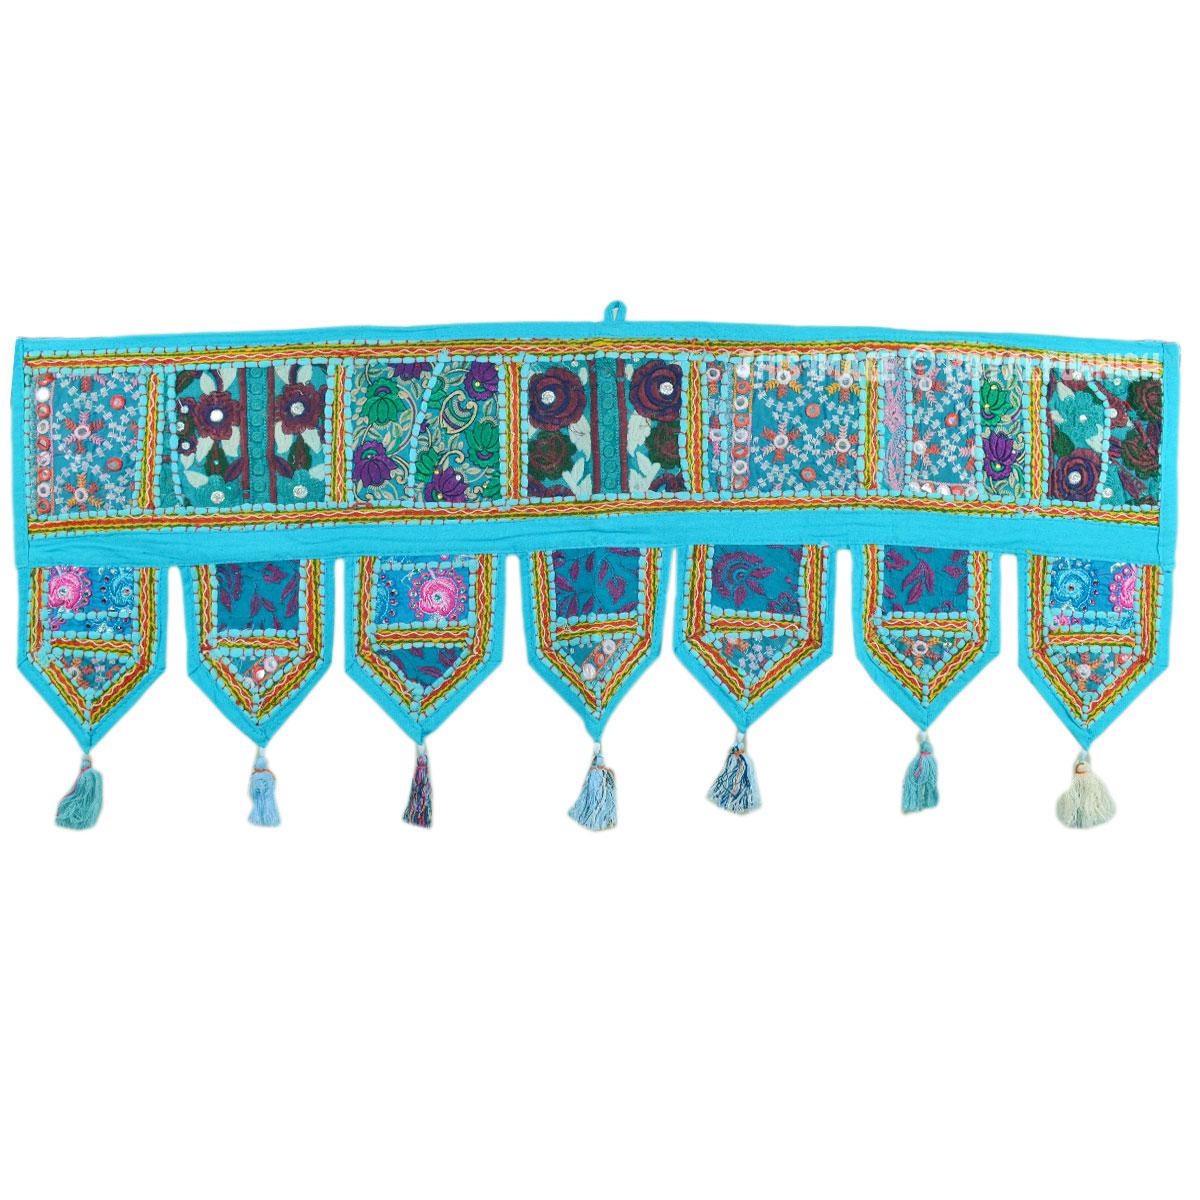 Turquoise Needlepoint Patchwork Embroidered Window Valance